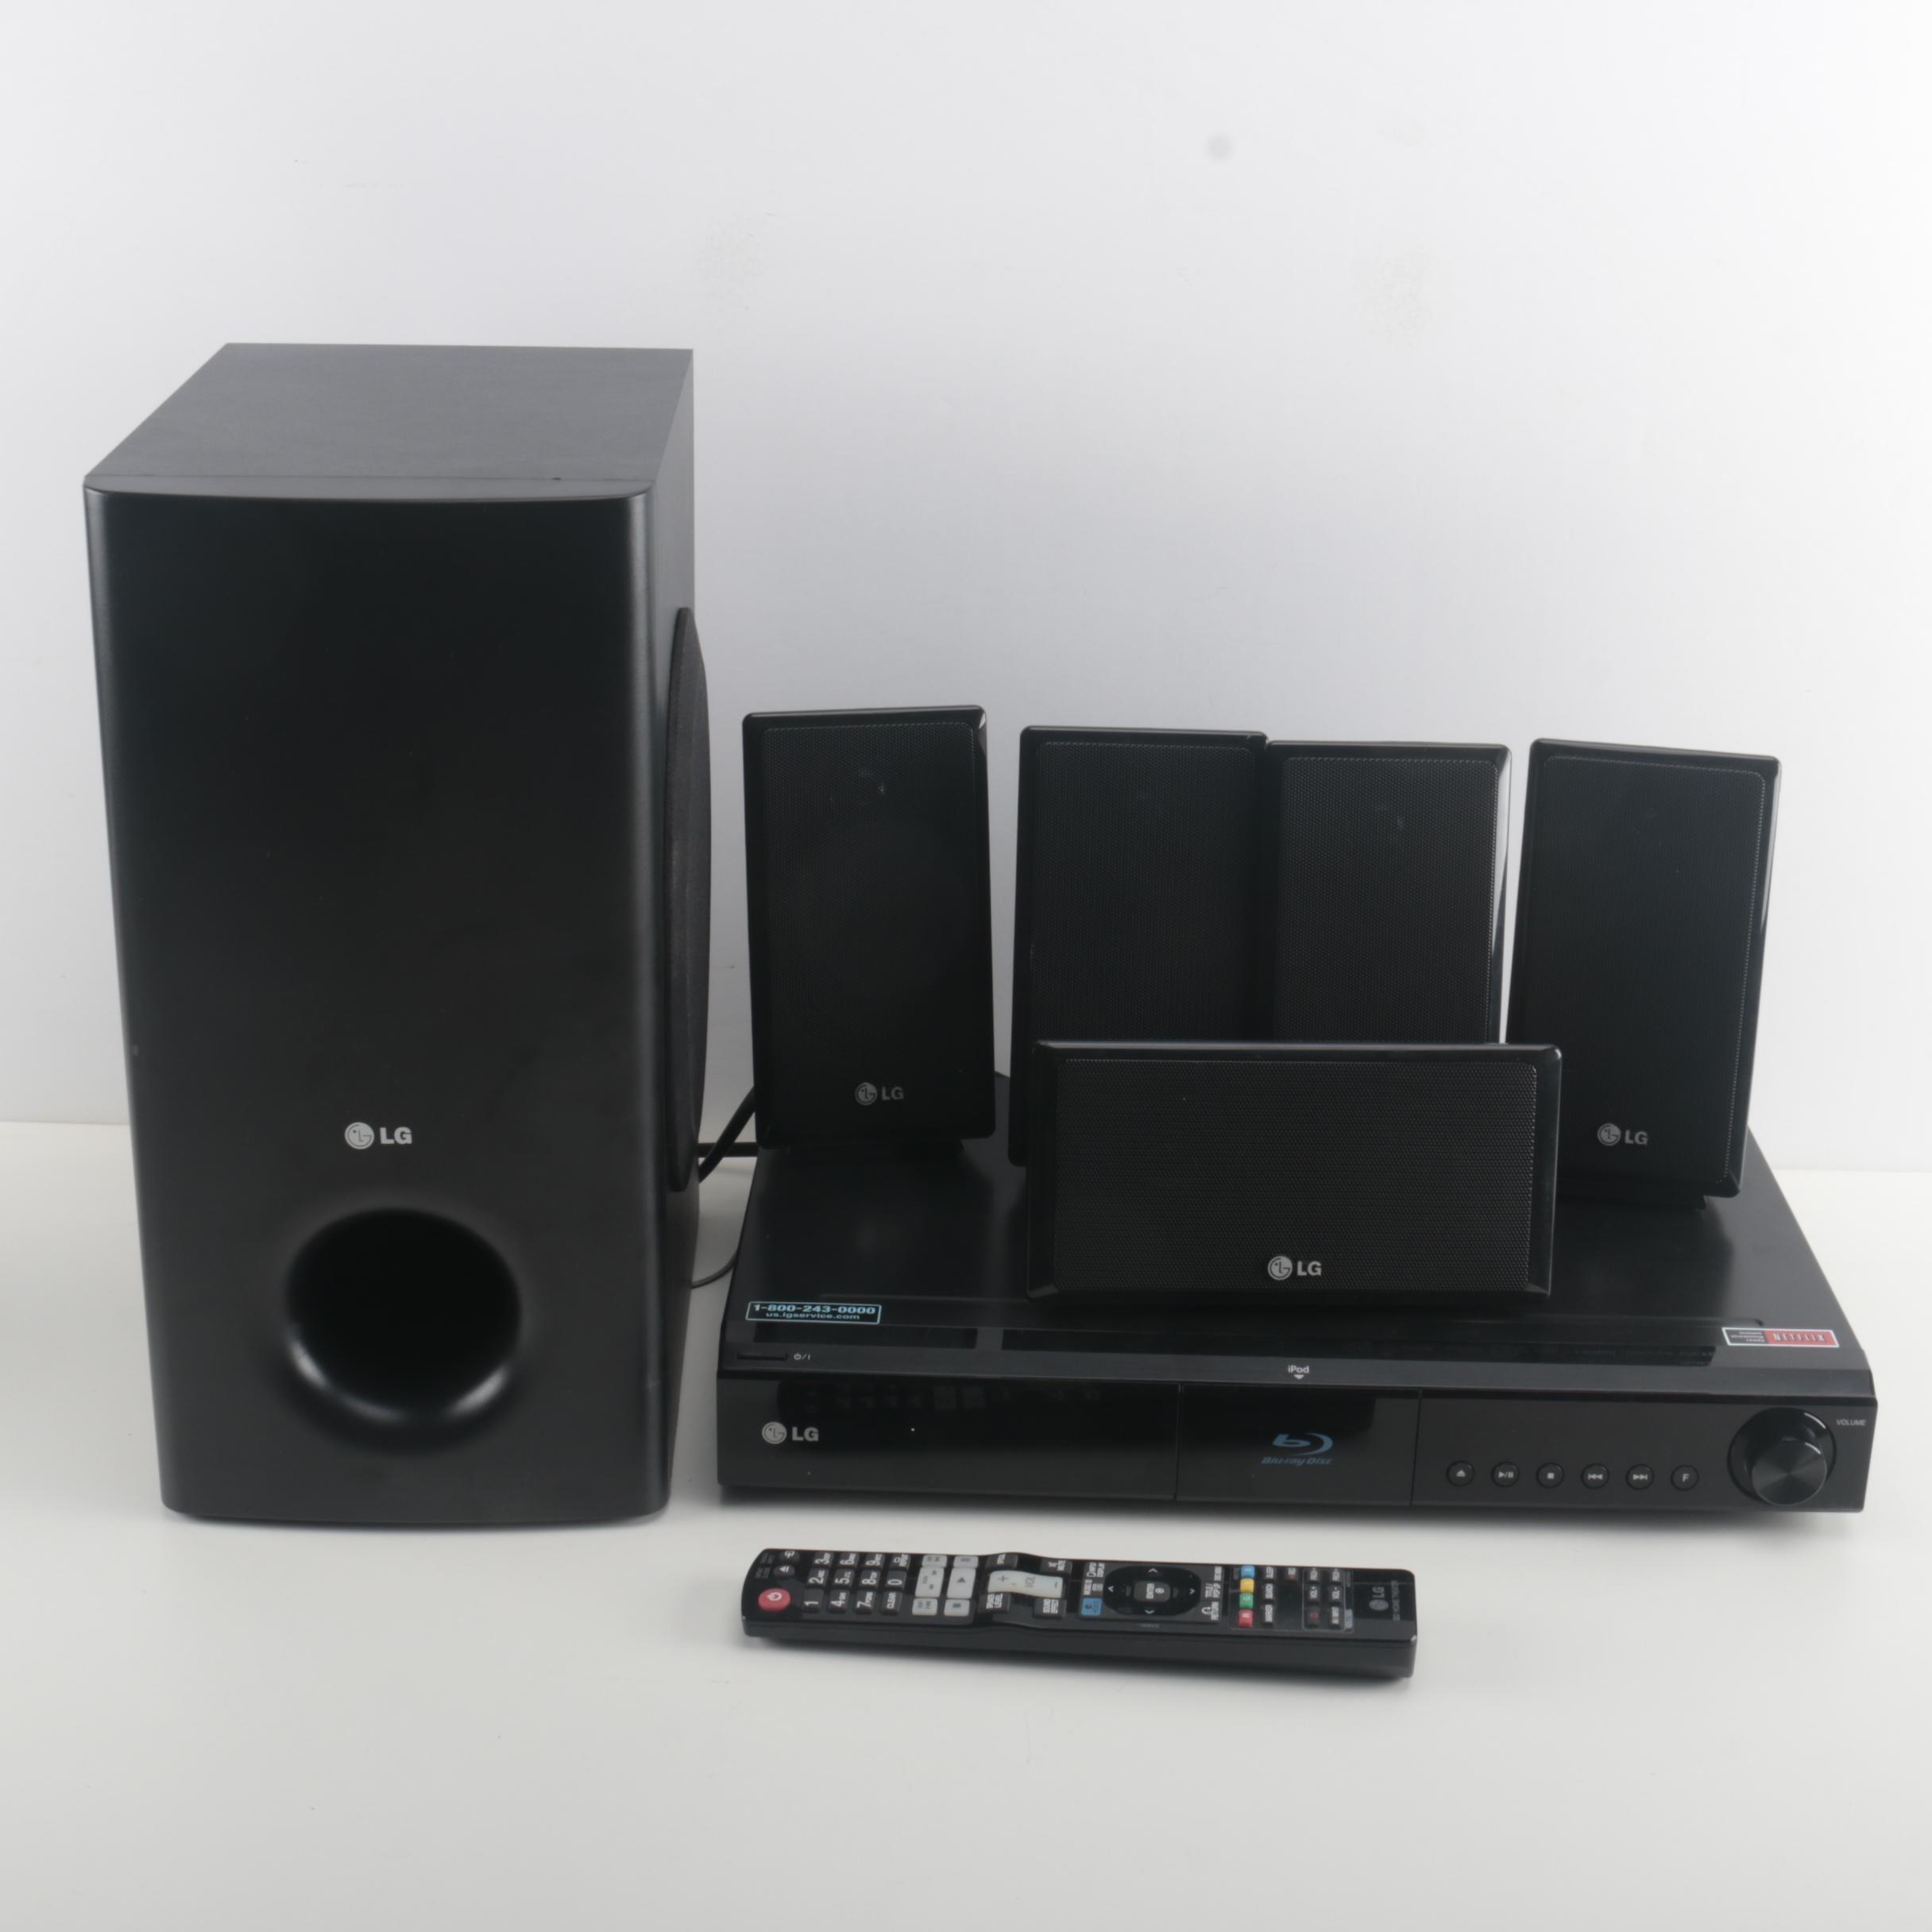 lg lhb335 blu ray home theater system ebth rh ebth com LG LHB335 Specs LG LHB335 Remote